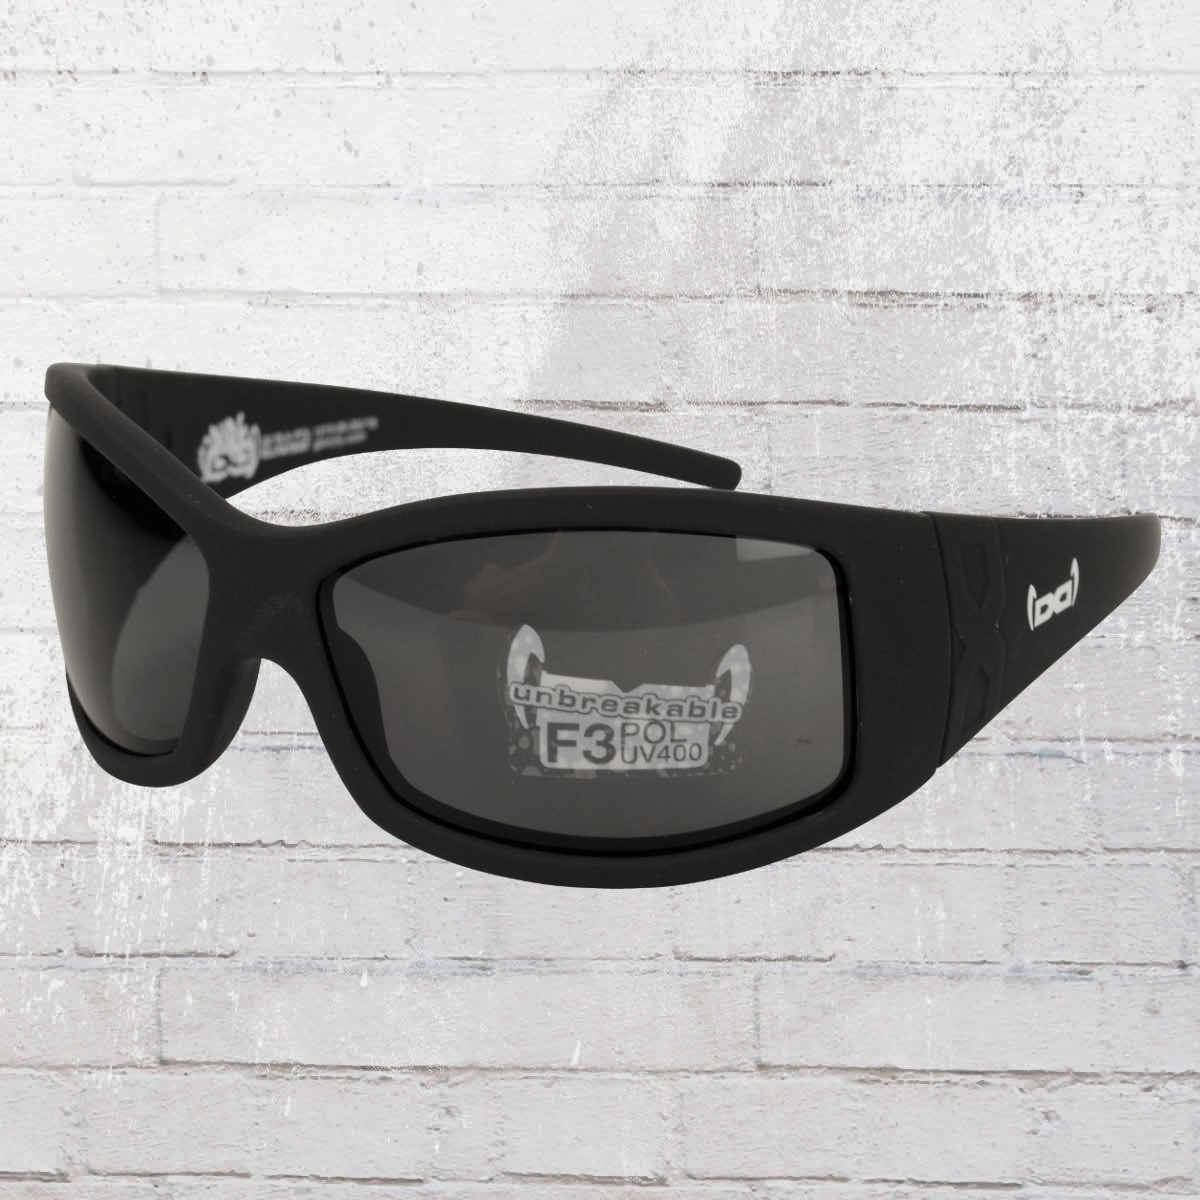 35a903bd4af Gloryfy Unbreakable Sun Glasses G2 Pure Black Polarized. ›‹ «